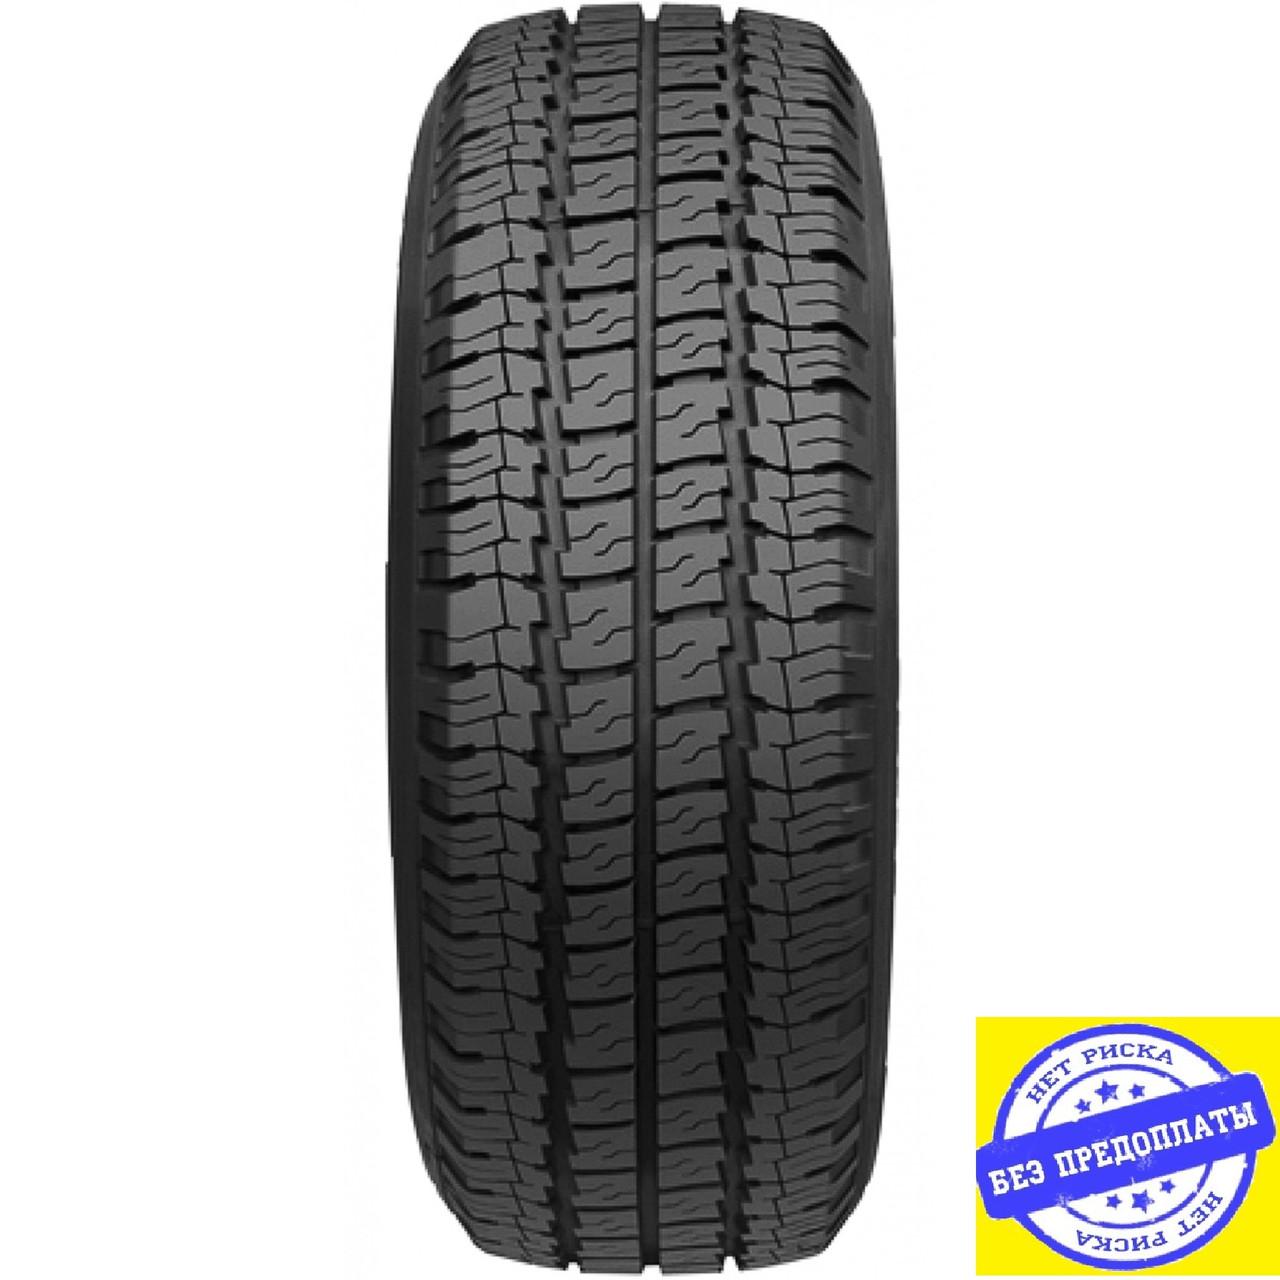 Легкогрузовые шины Taurus (Michelin)  LIGHT TRUCK 101, 235 65 16c